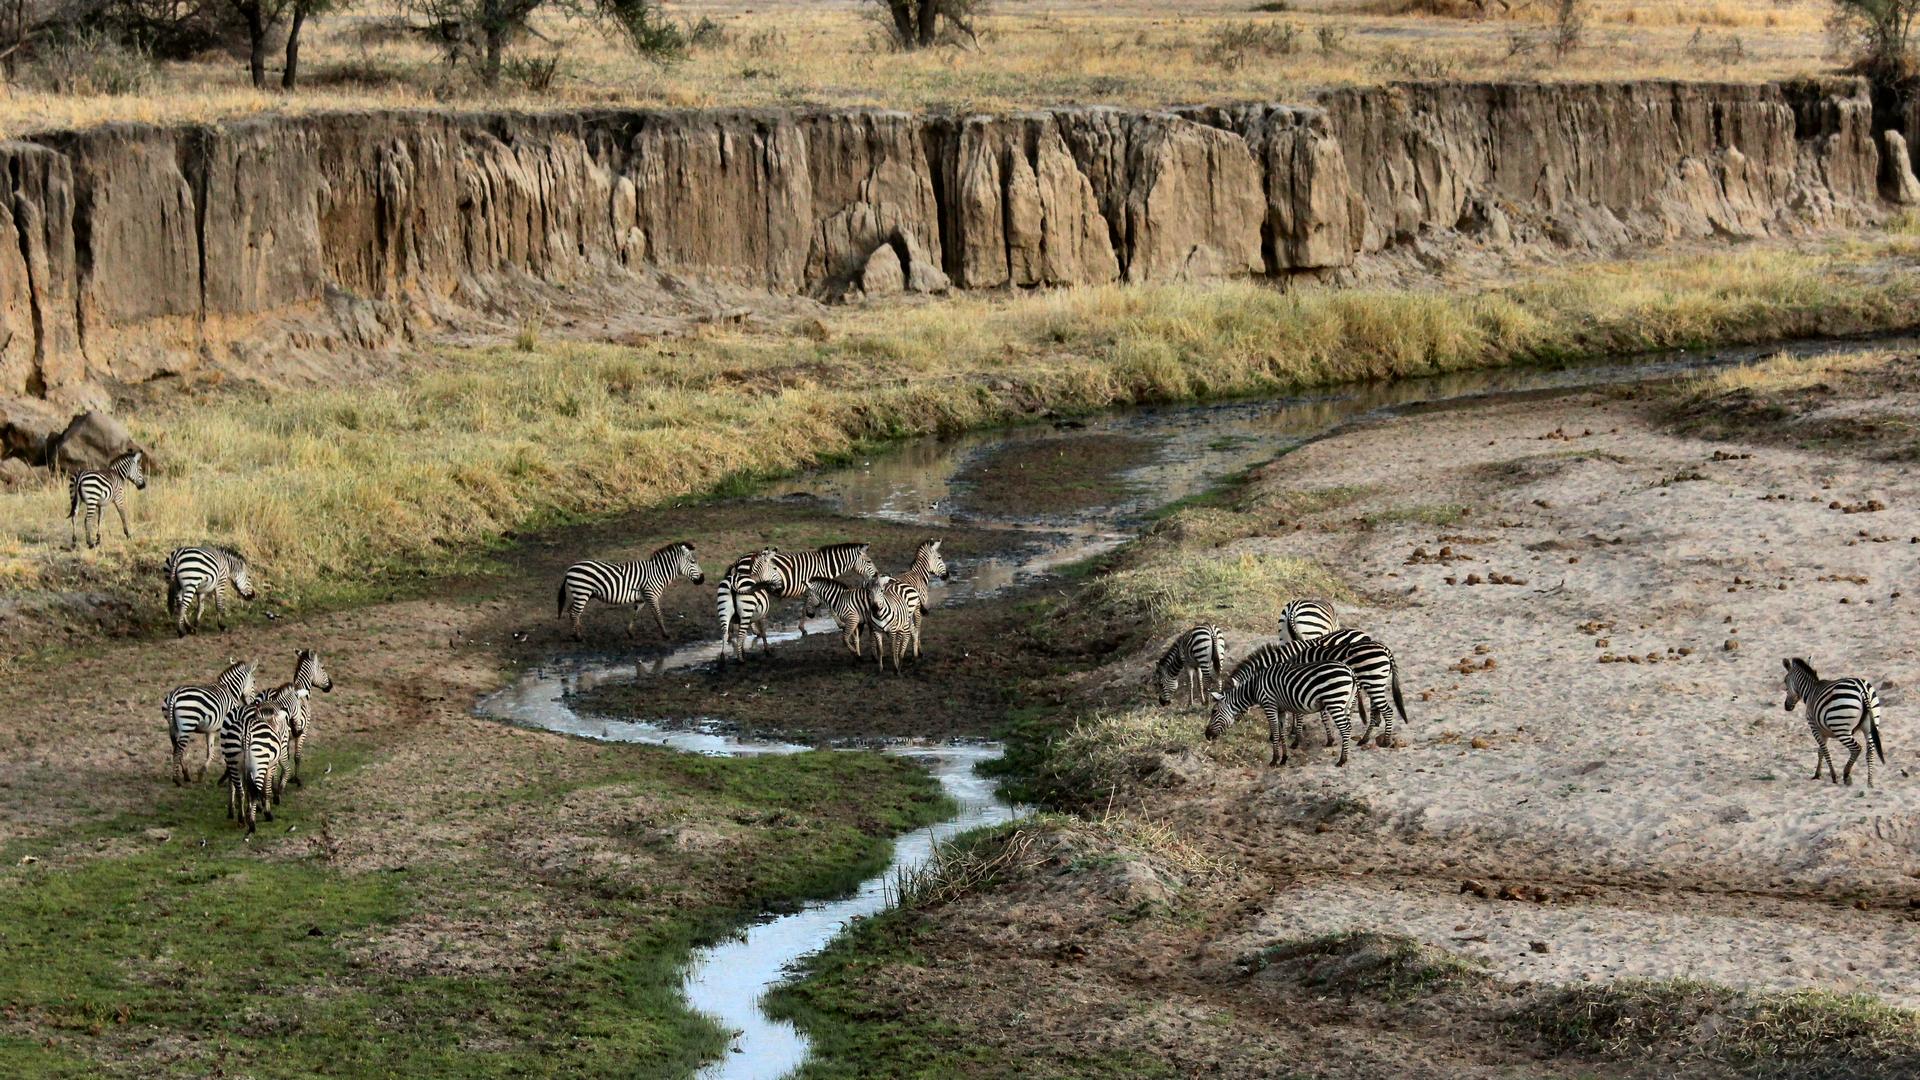 A view in Tanzania